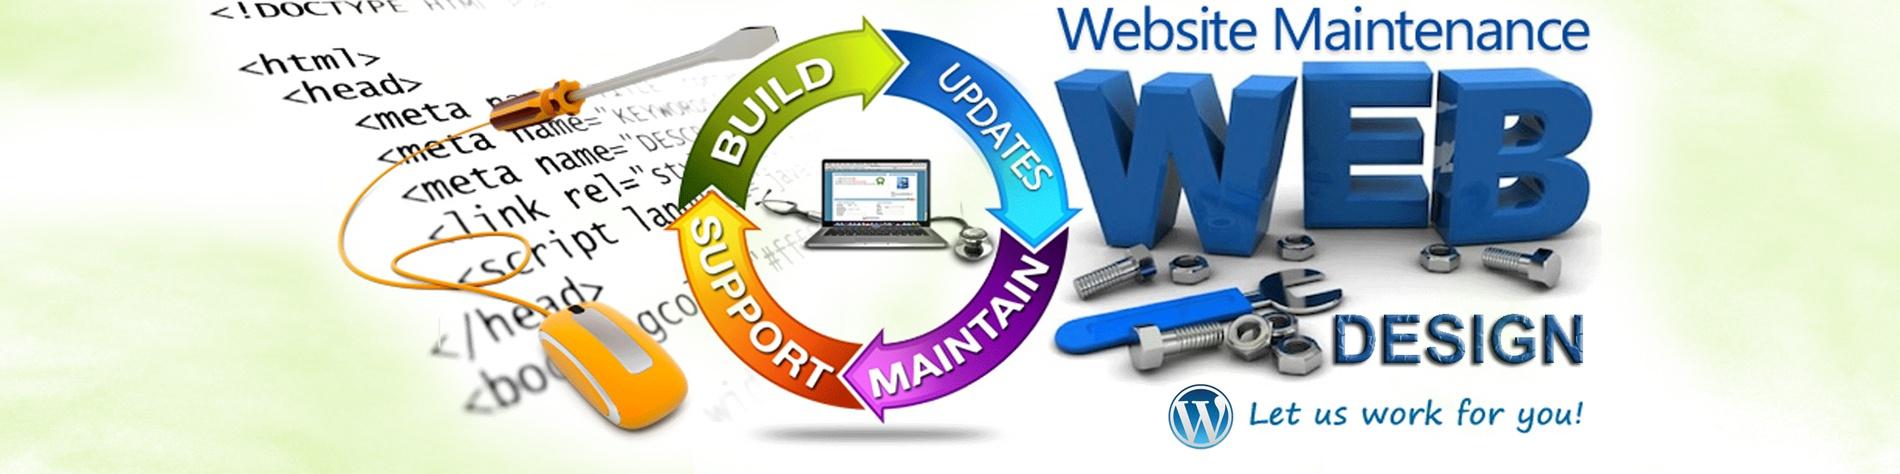 Wowsers Web Design Website Maintenance